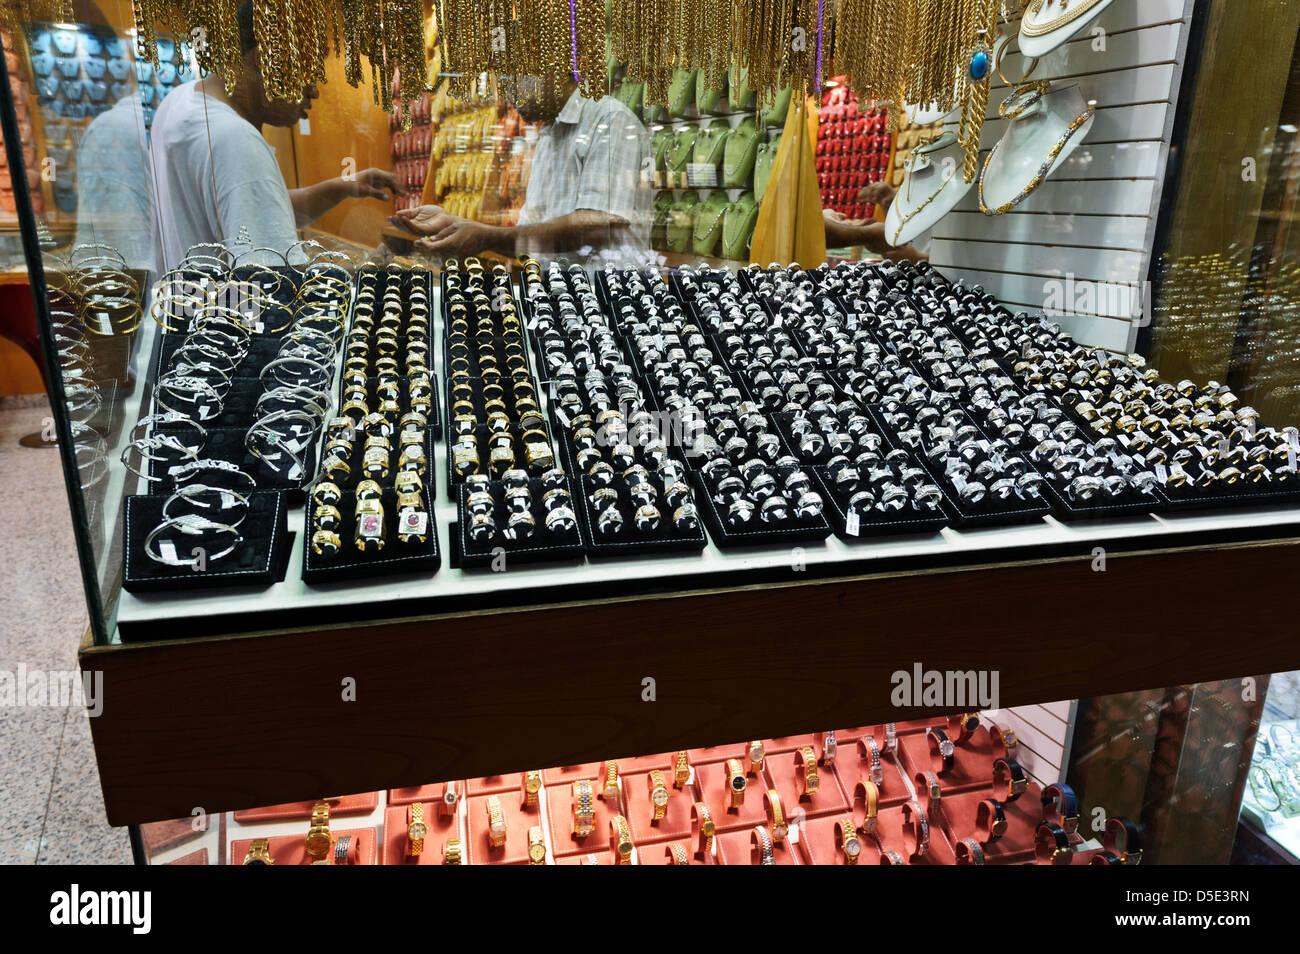 Gold and silver rings on display for sale, Dubai Gold souk, Dubai, United Arab Emirates. - Stock Image